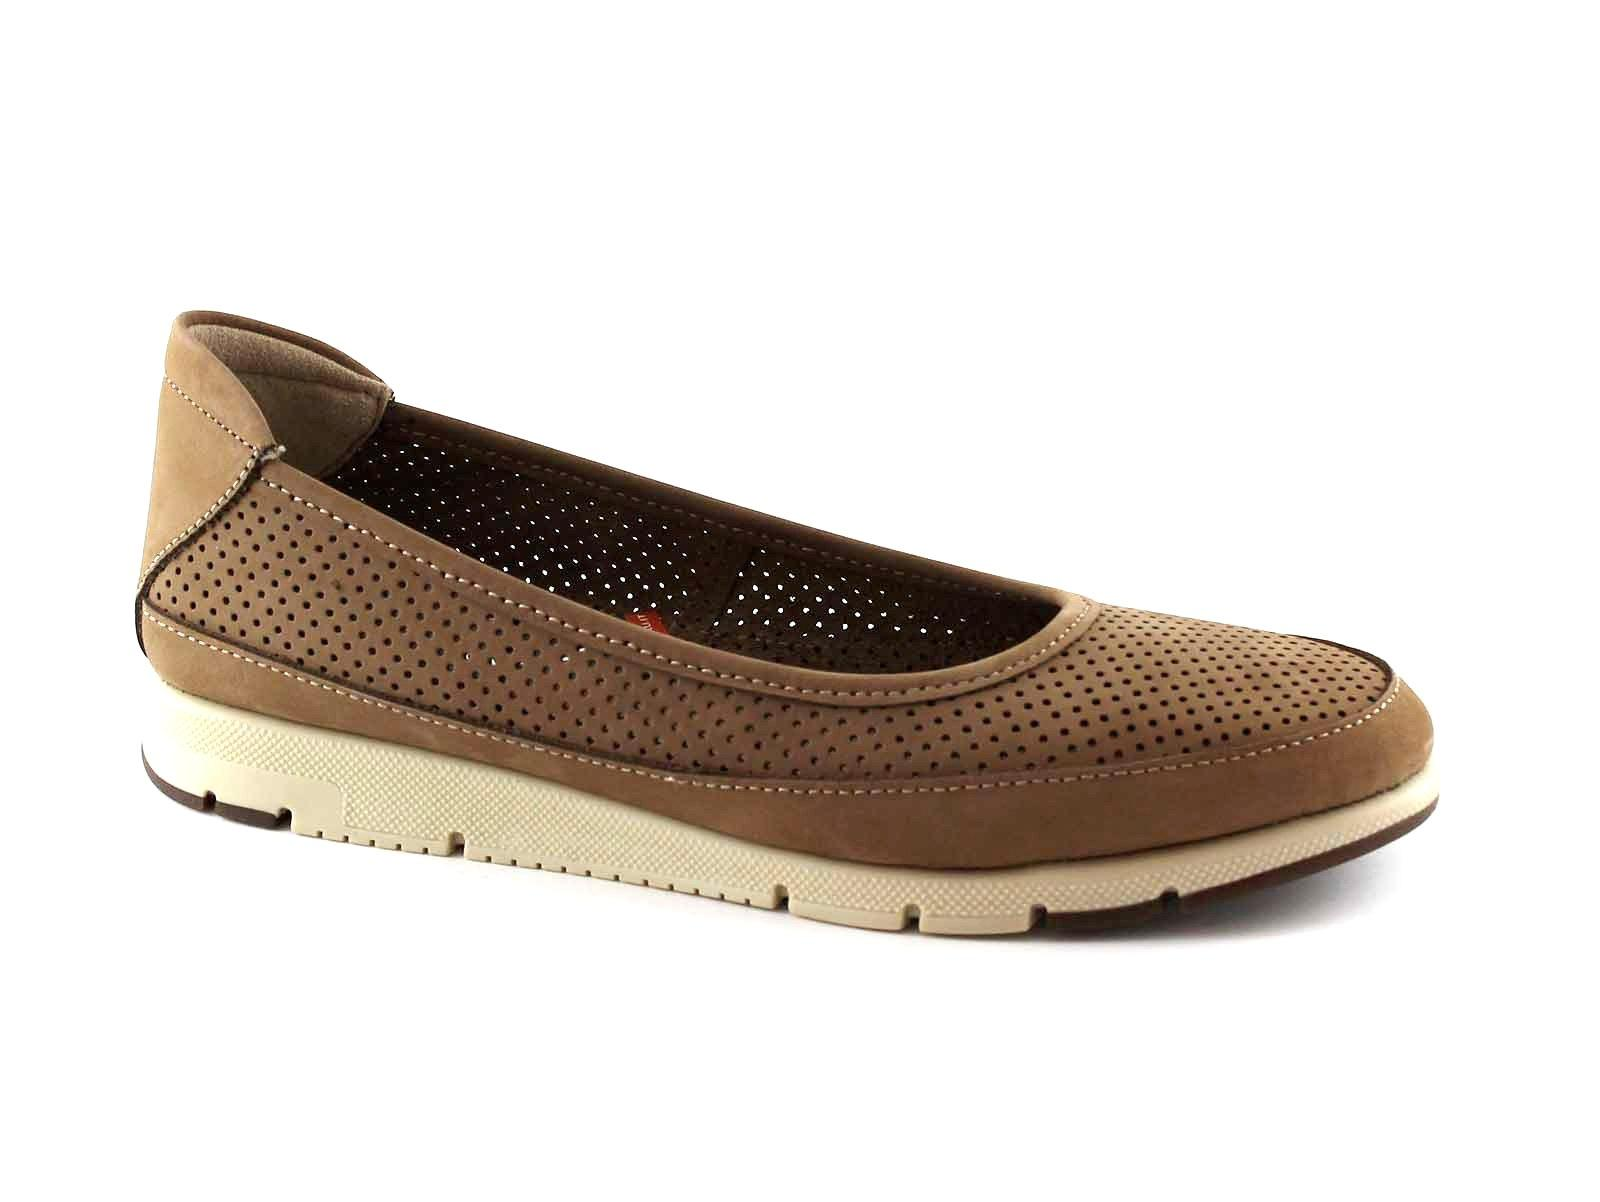 FRAU FX 51G2 taupe marrone scarpe donna ballerine pelle fori linea comfort